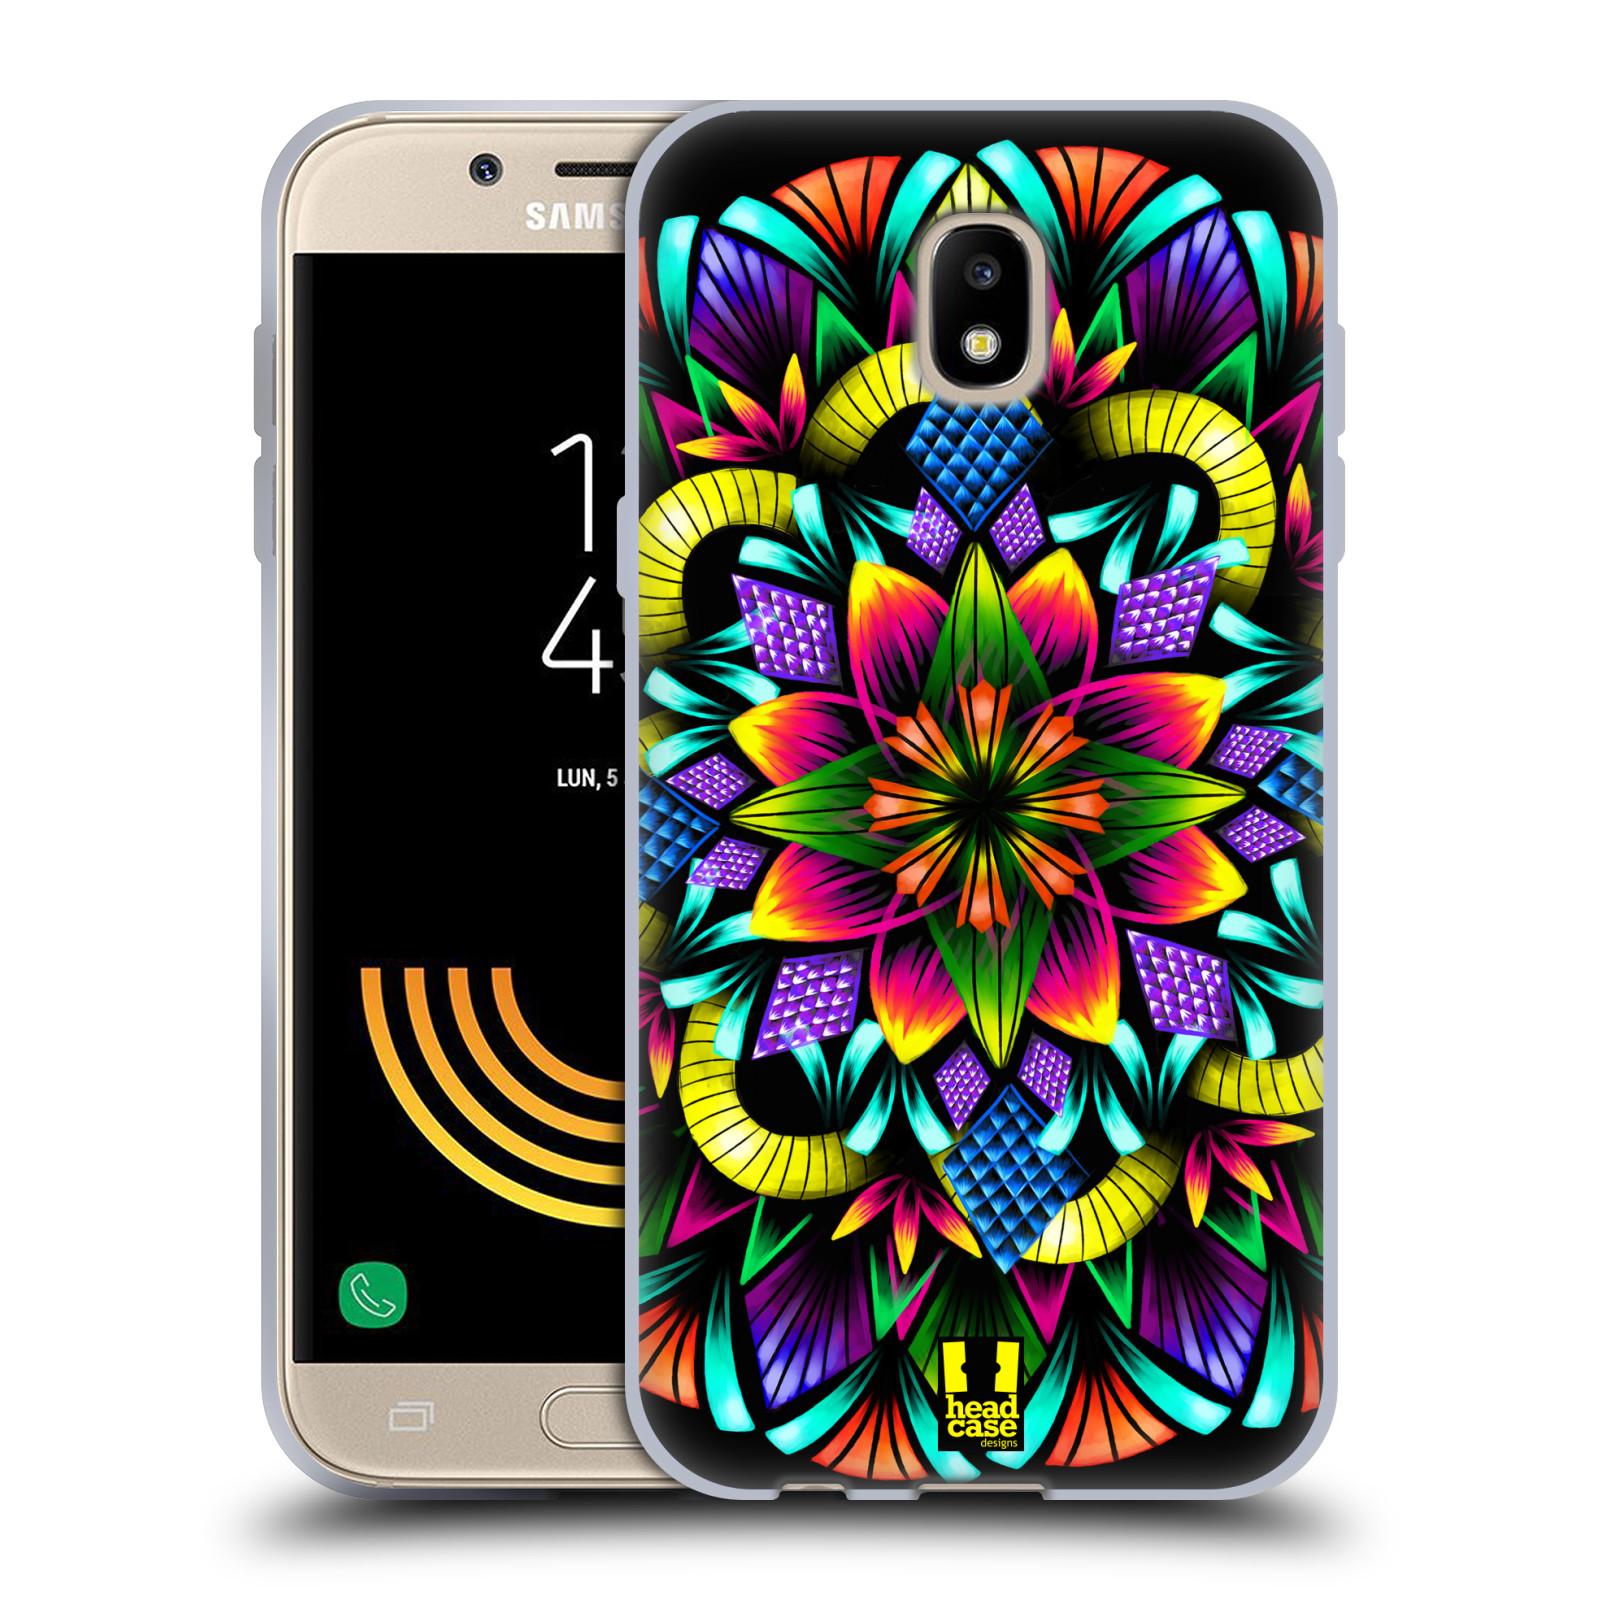 Silikonové pouzdro na mobil Samsung Galaxy J5 (2017) - Head Case - Květina mandala